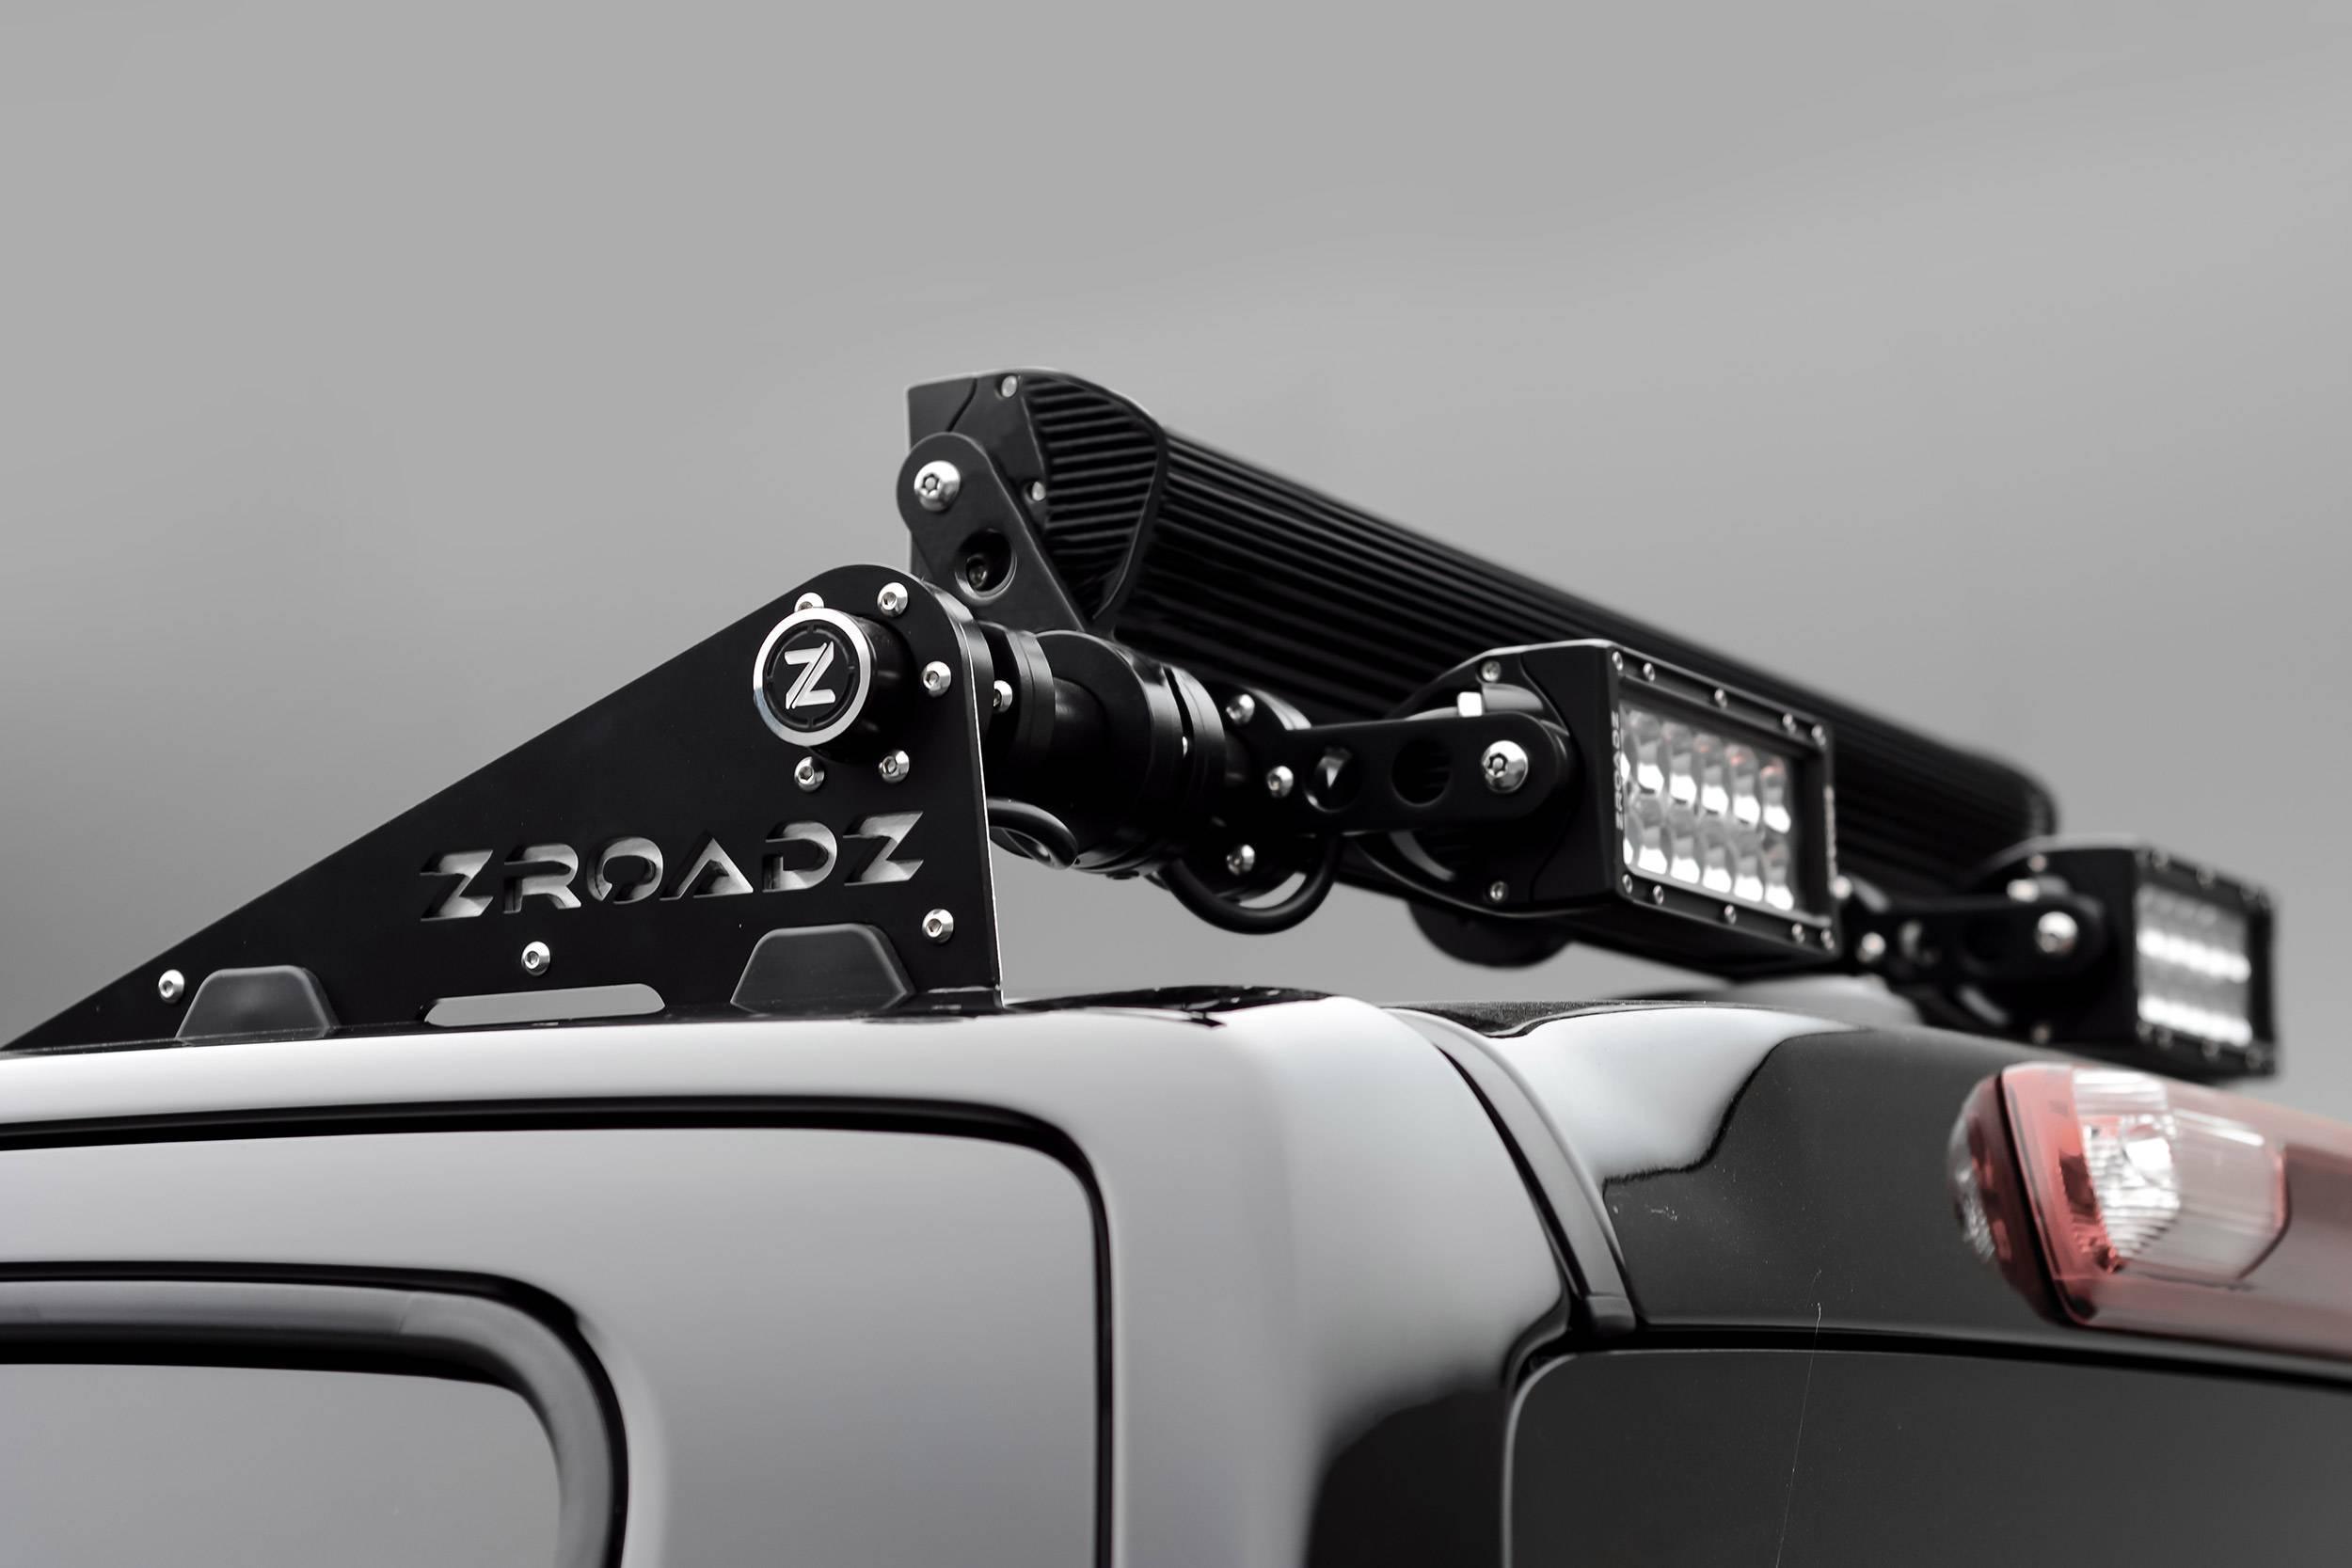 ZROADZ - Universal Modular Rack LED Bracket adjustable to mount up to (4) various size LED Light Bars - PN #Z350040